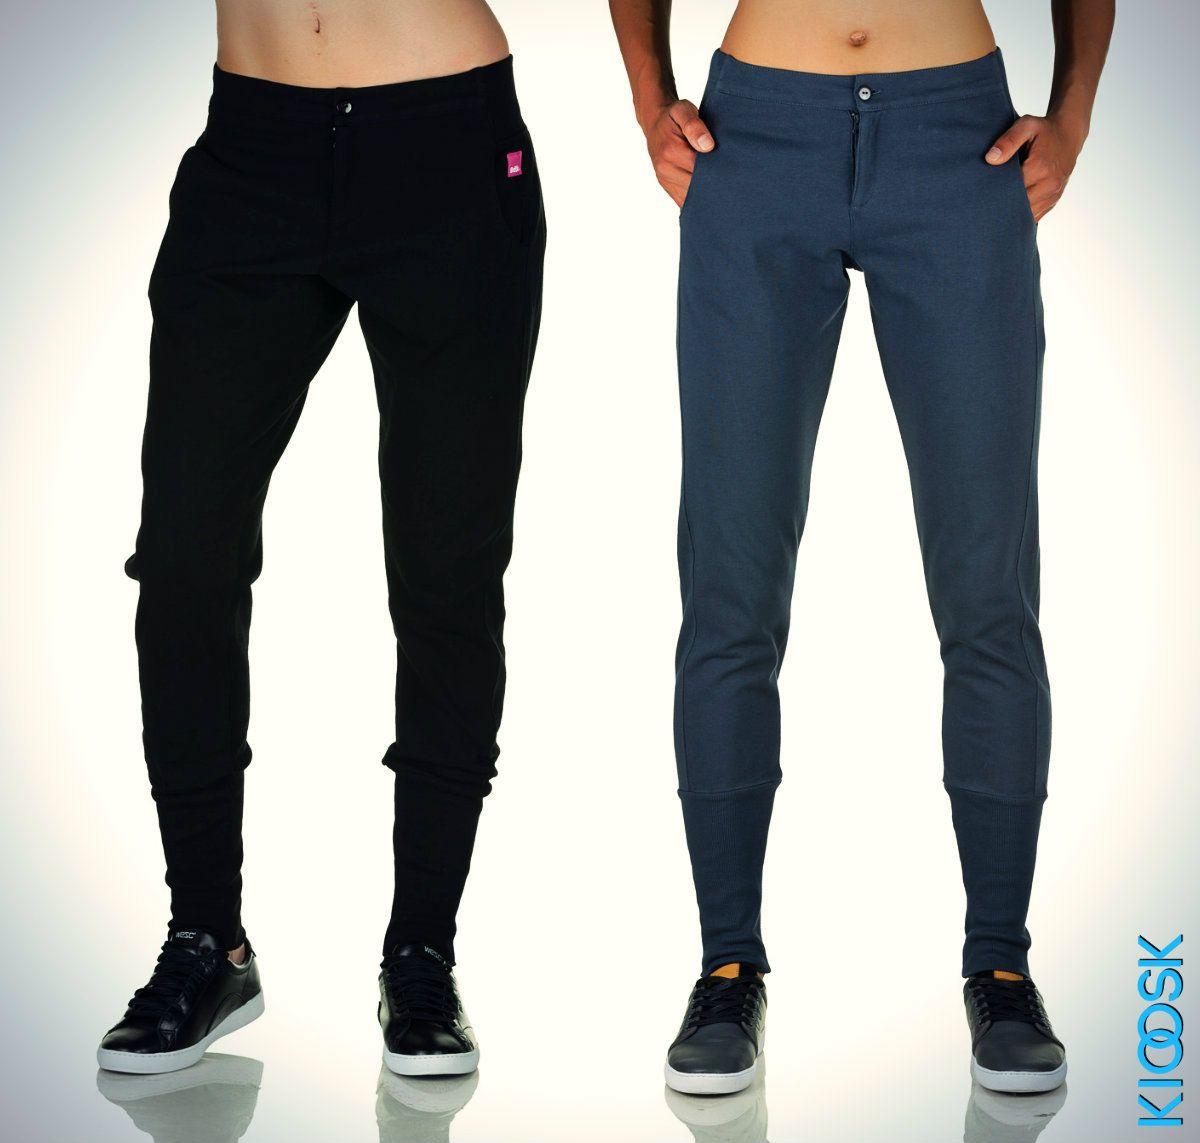 www.kioosk.si Black jeans, Line shopping, Sport fashion